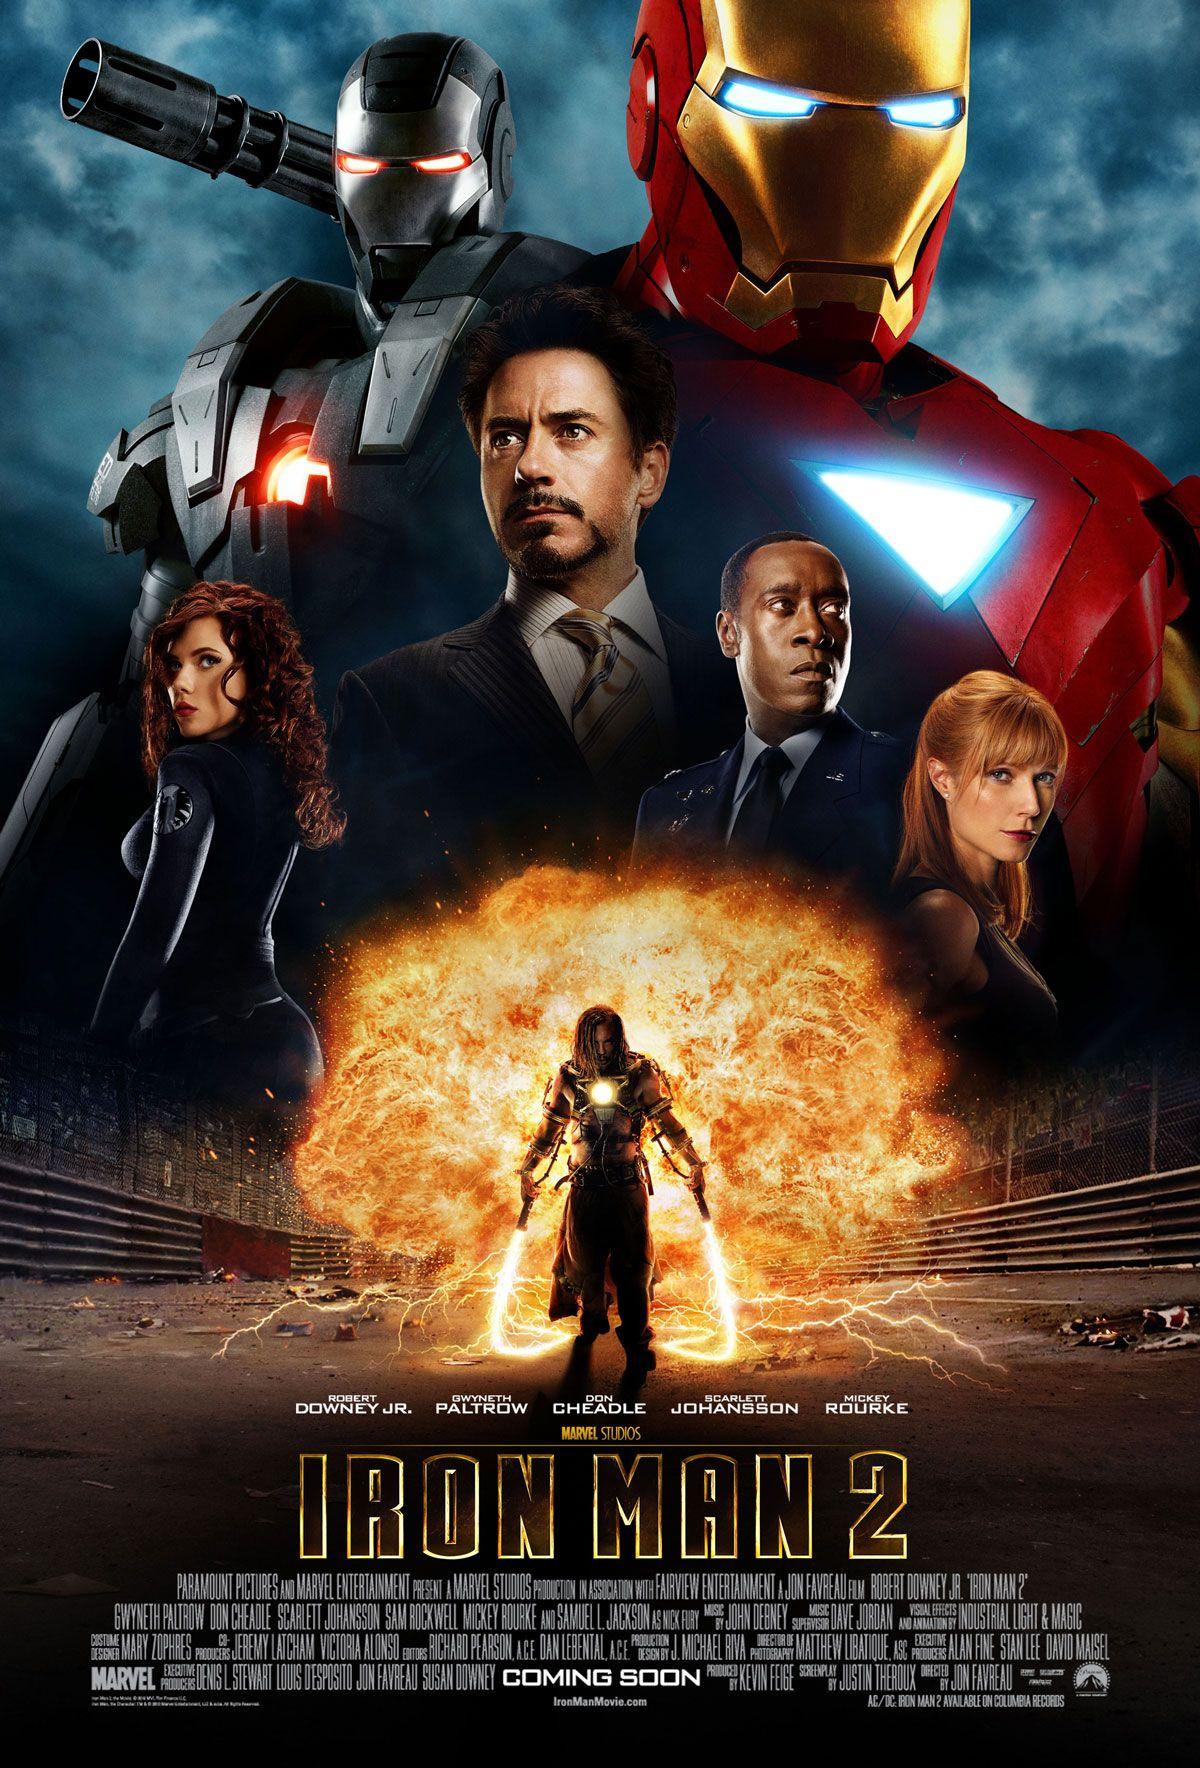 new iron man 2 poster shows off scarlett johansson | movies